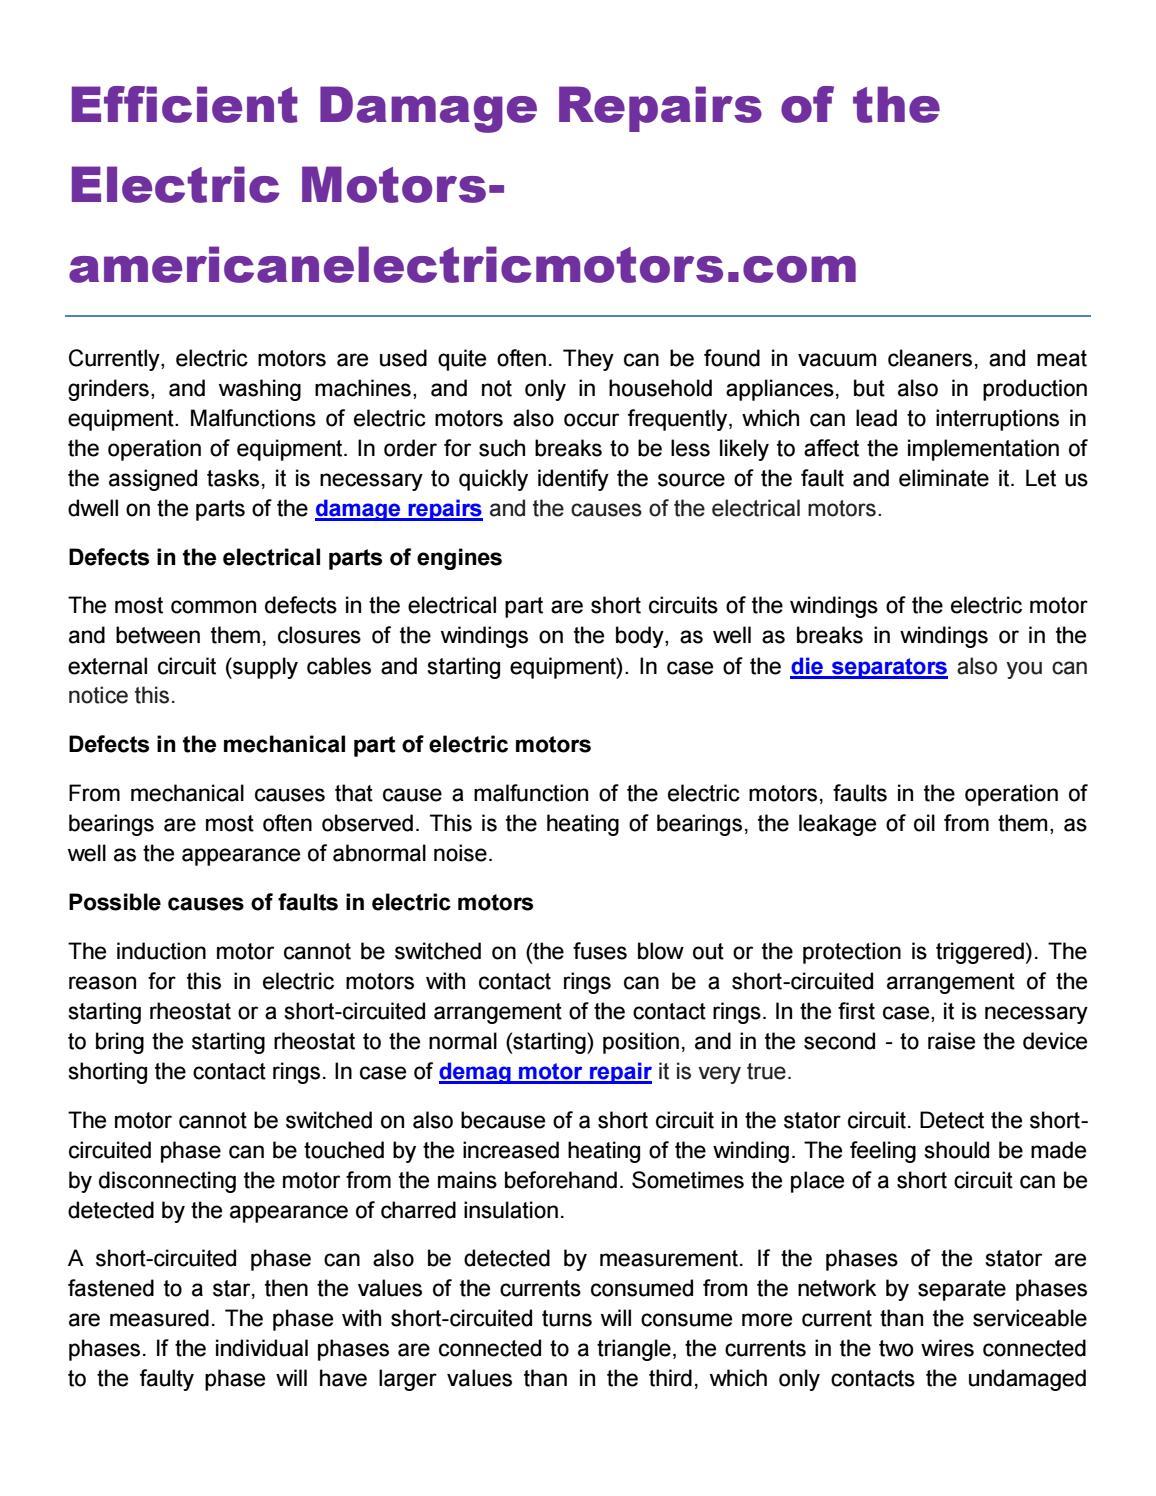 Efficient damage repairs of the electric motors americanelectricmotors com